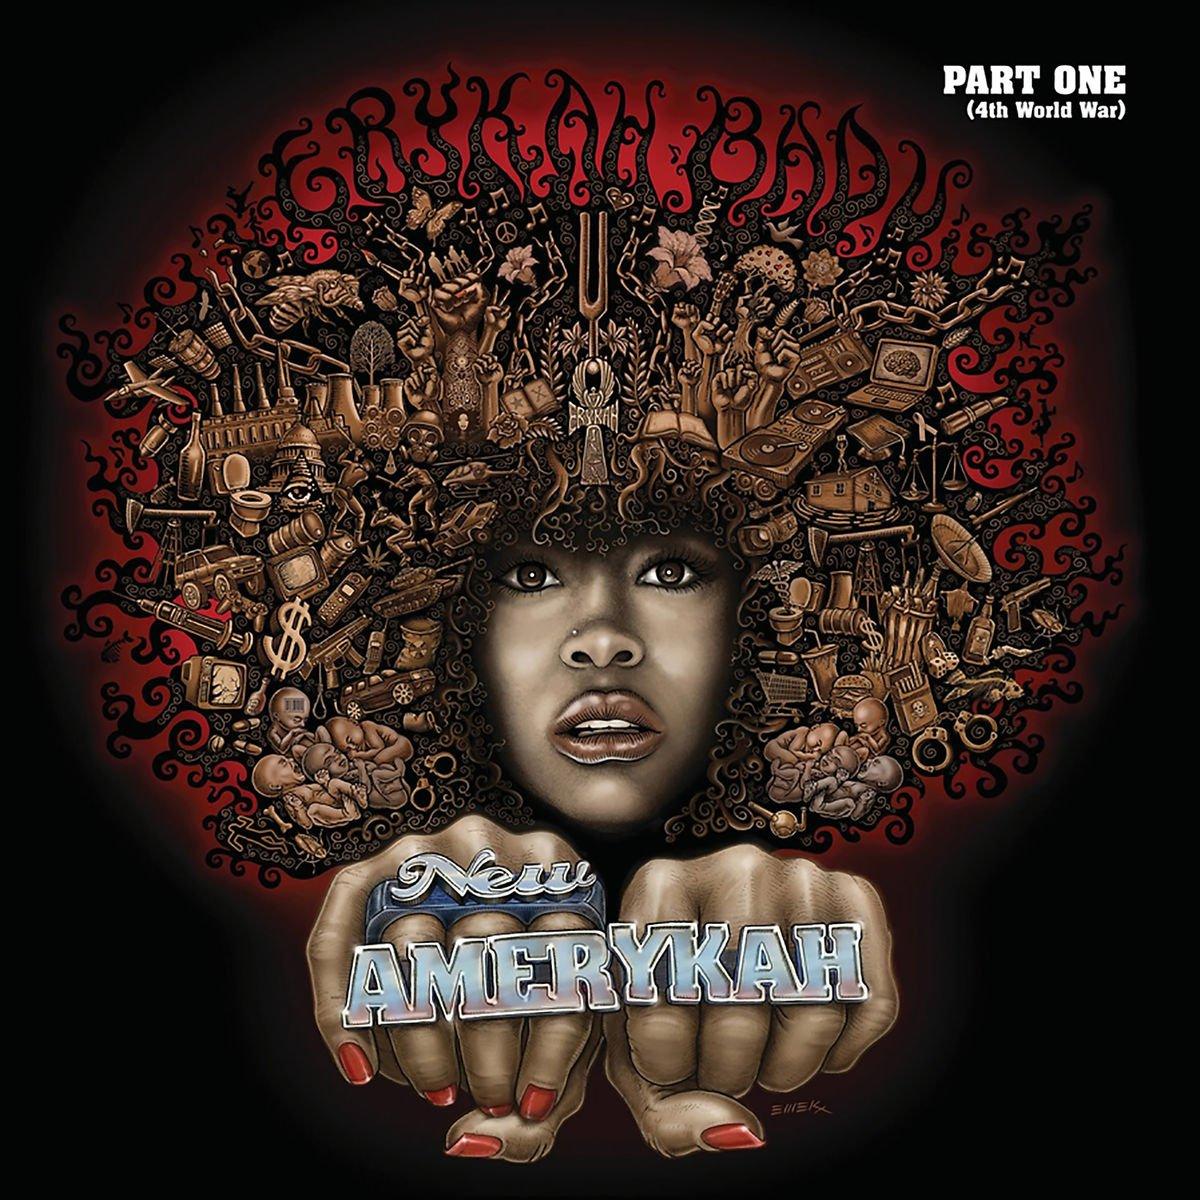 audio review : New Amerykah : Part One [ 4th World War ] ( album ) ... Erykah Badu